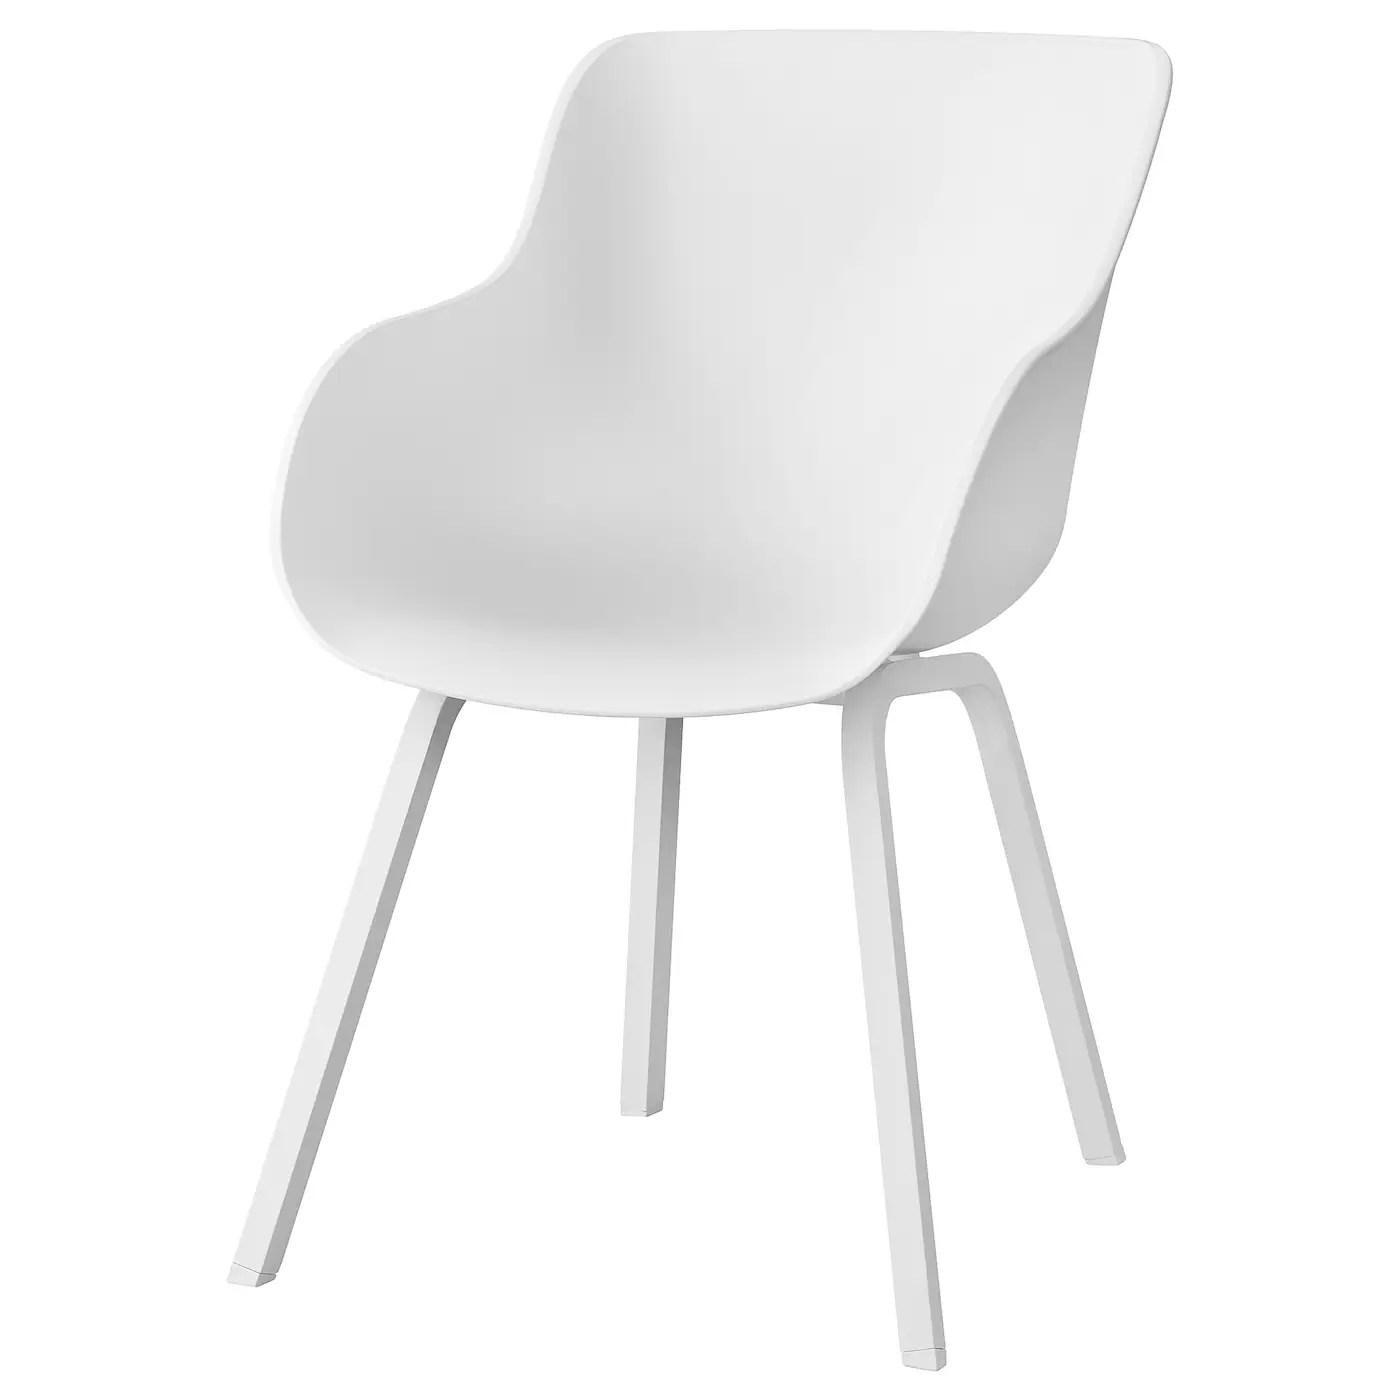 torvid chaise interieur exterieur blanc aluminium blanc